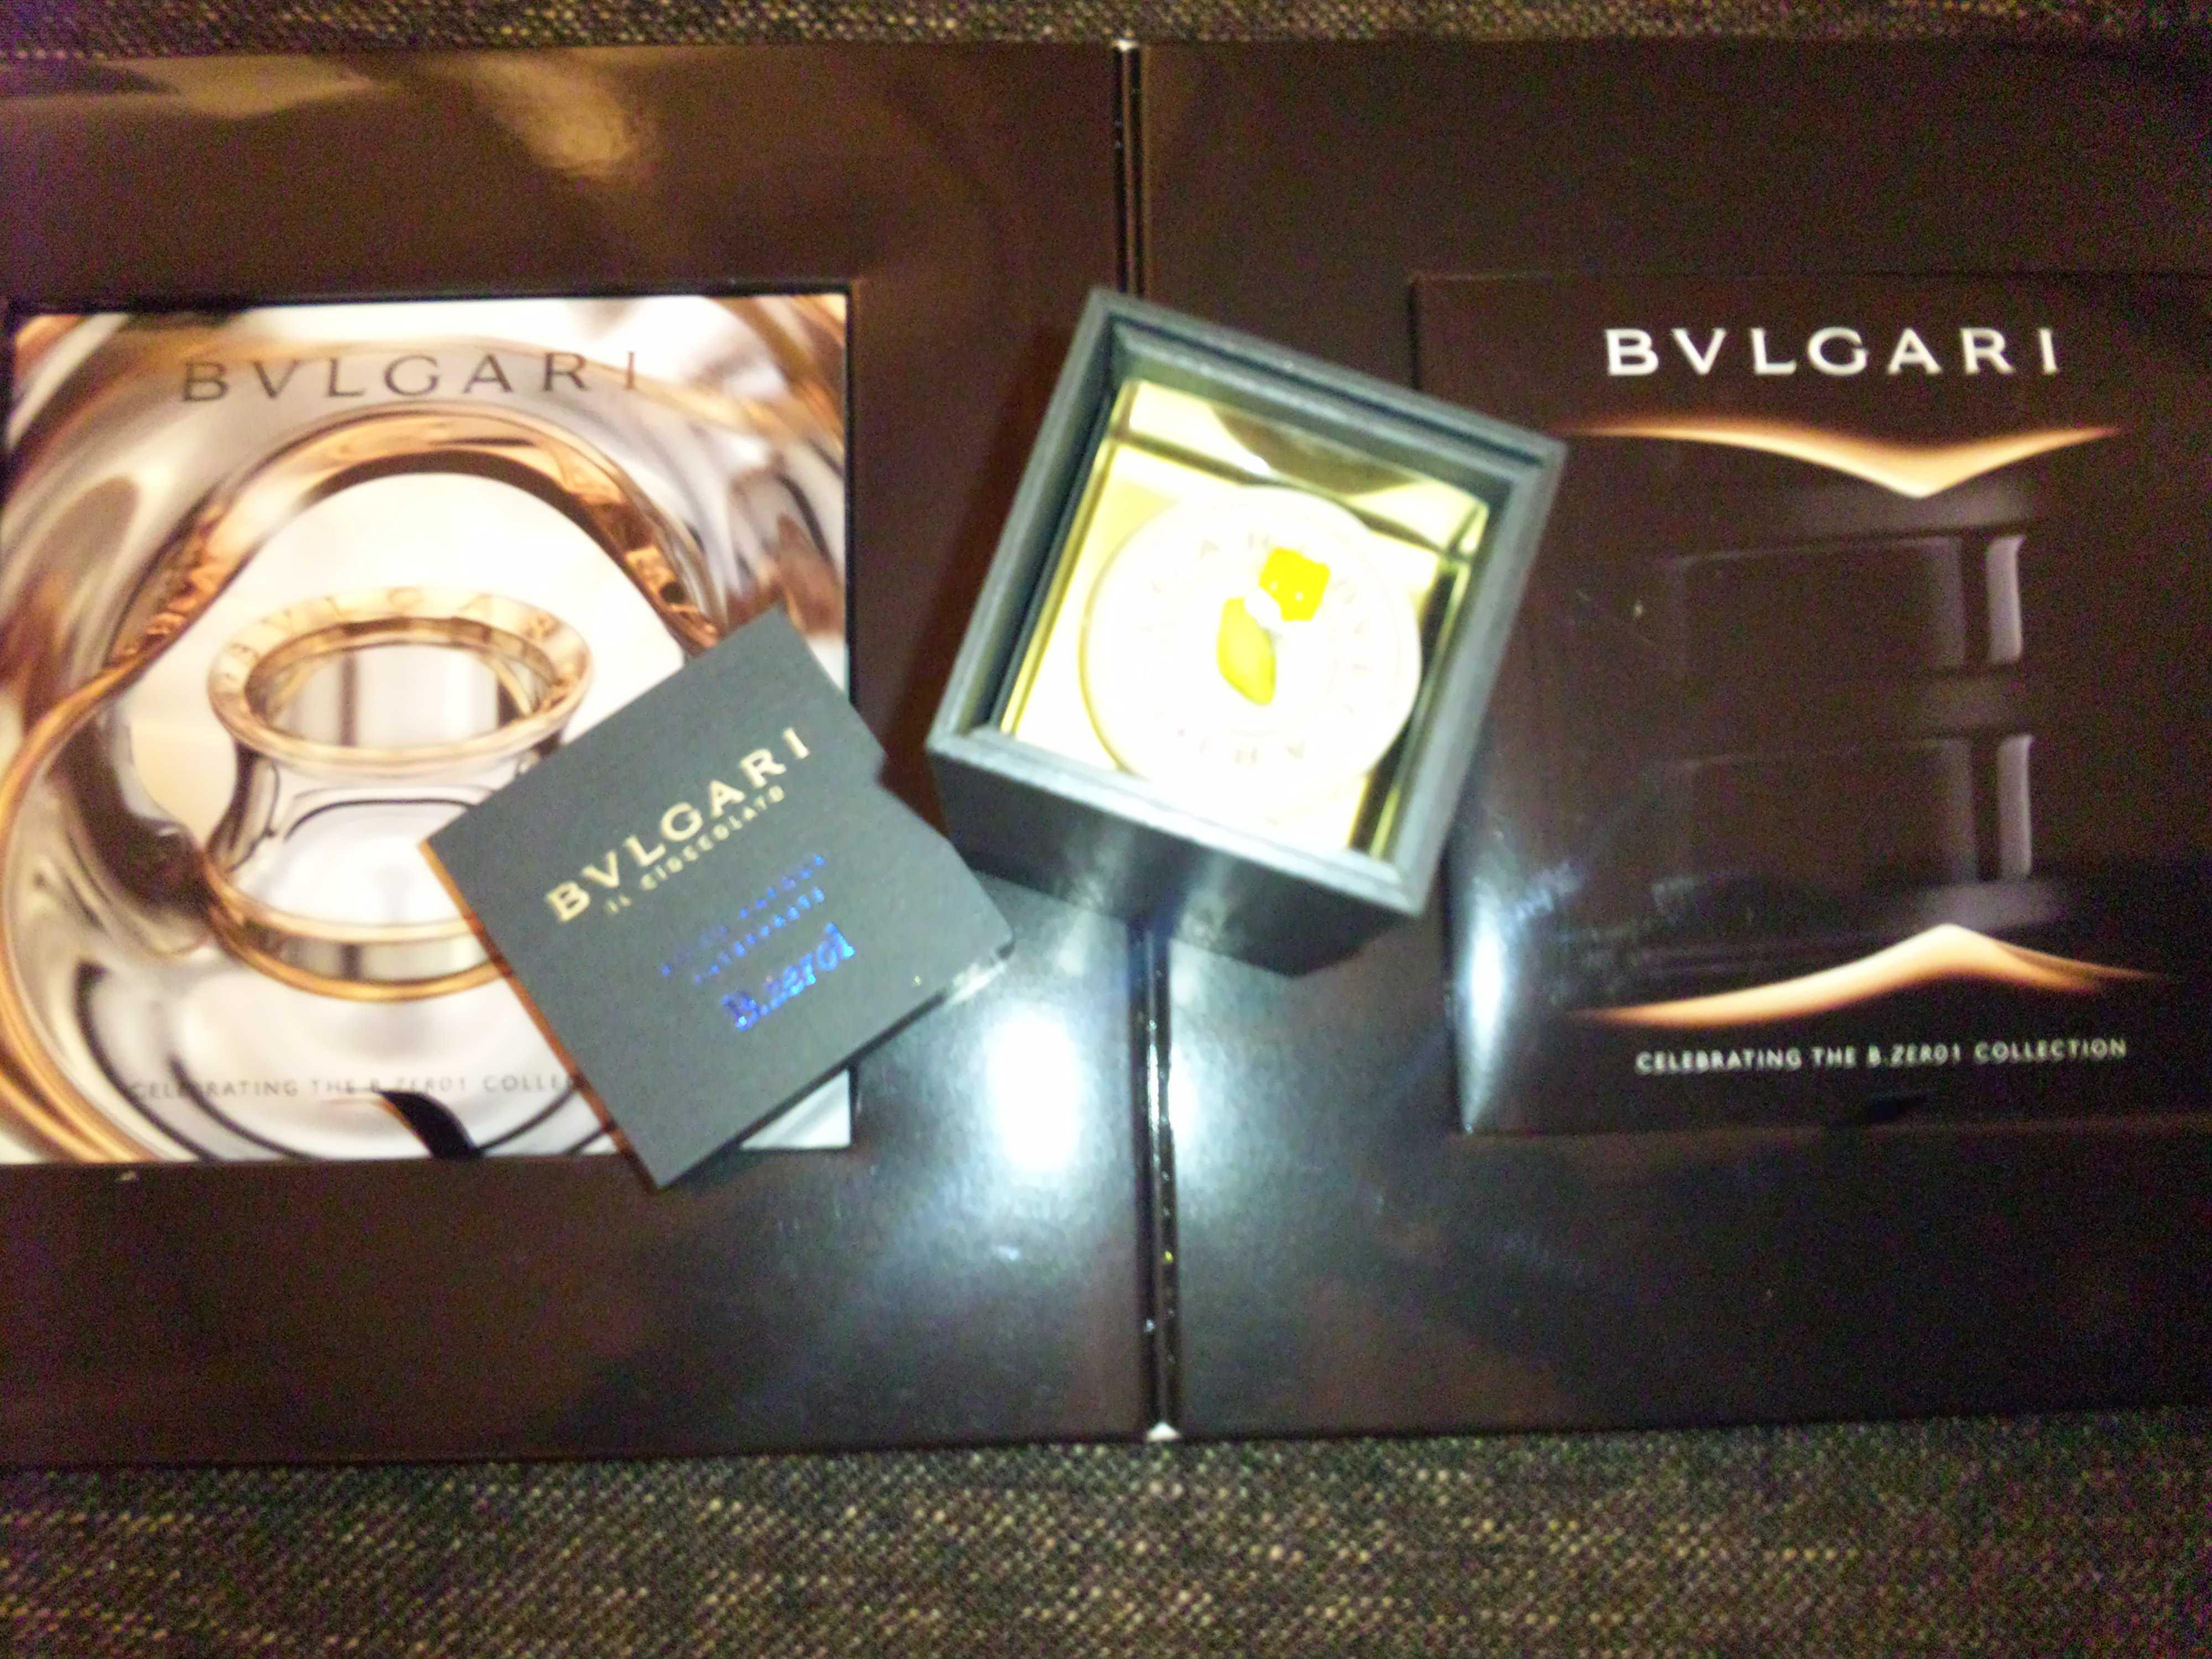 BVLGARIの新作発表会1_d0339677_11481537.jpg